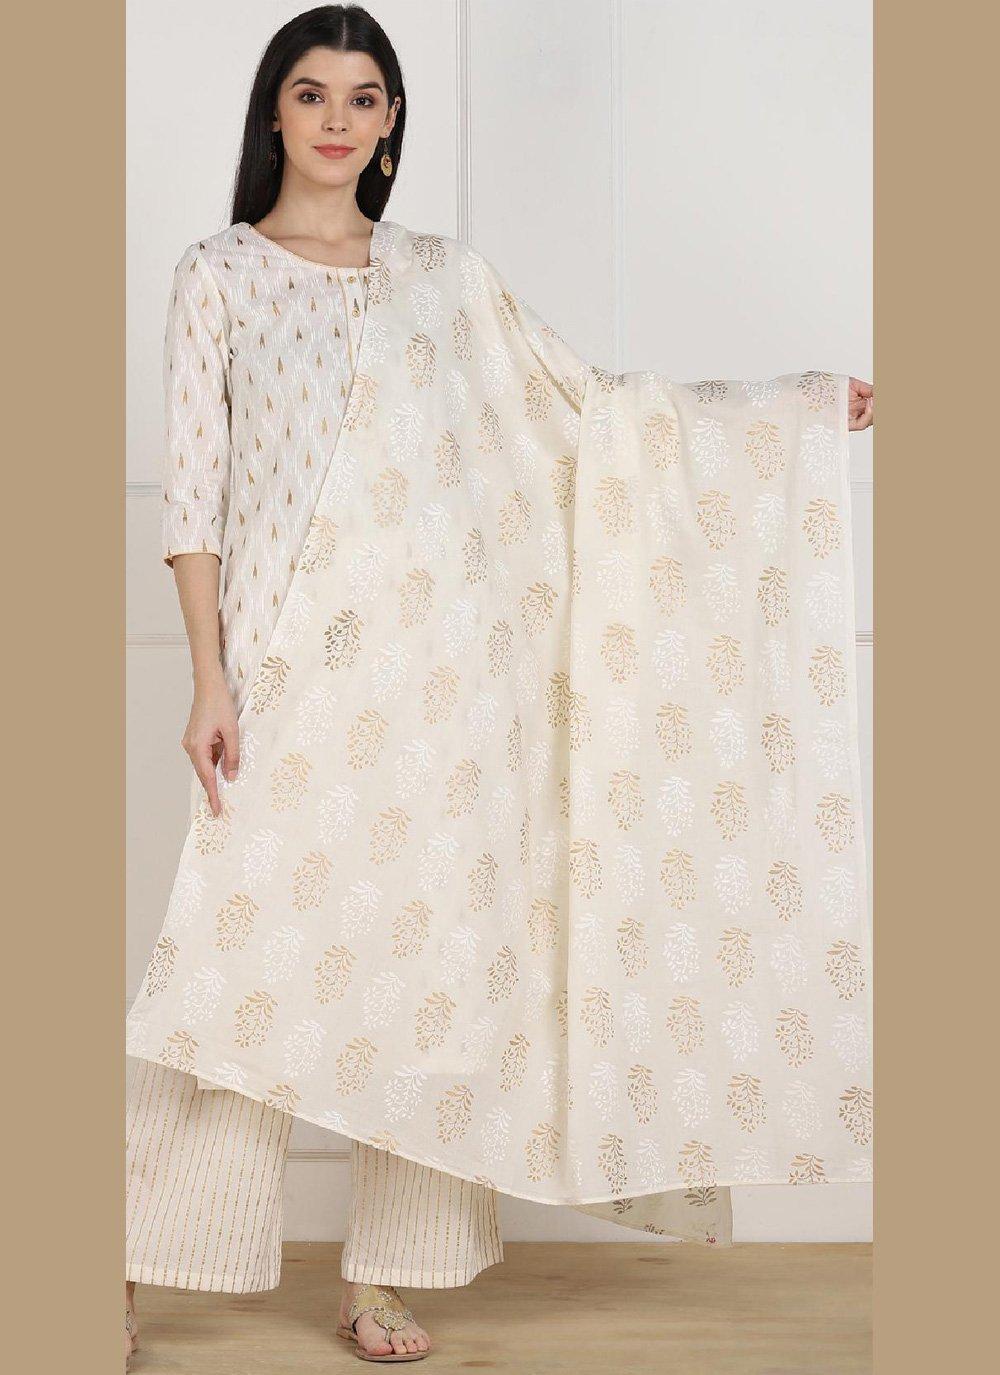 Cotton Printed Casual Kurti in Off White